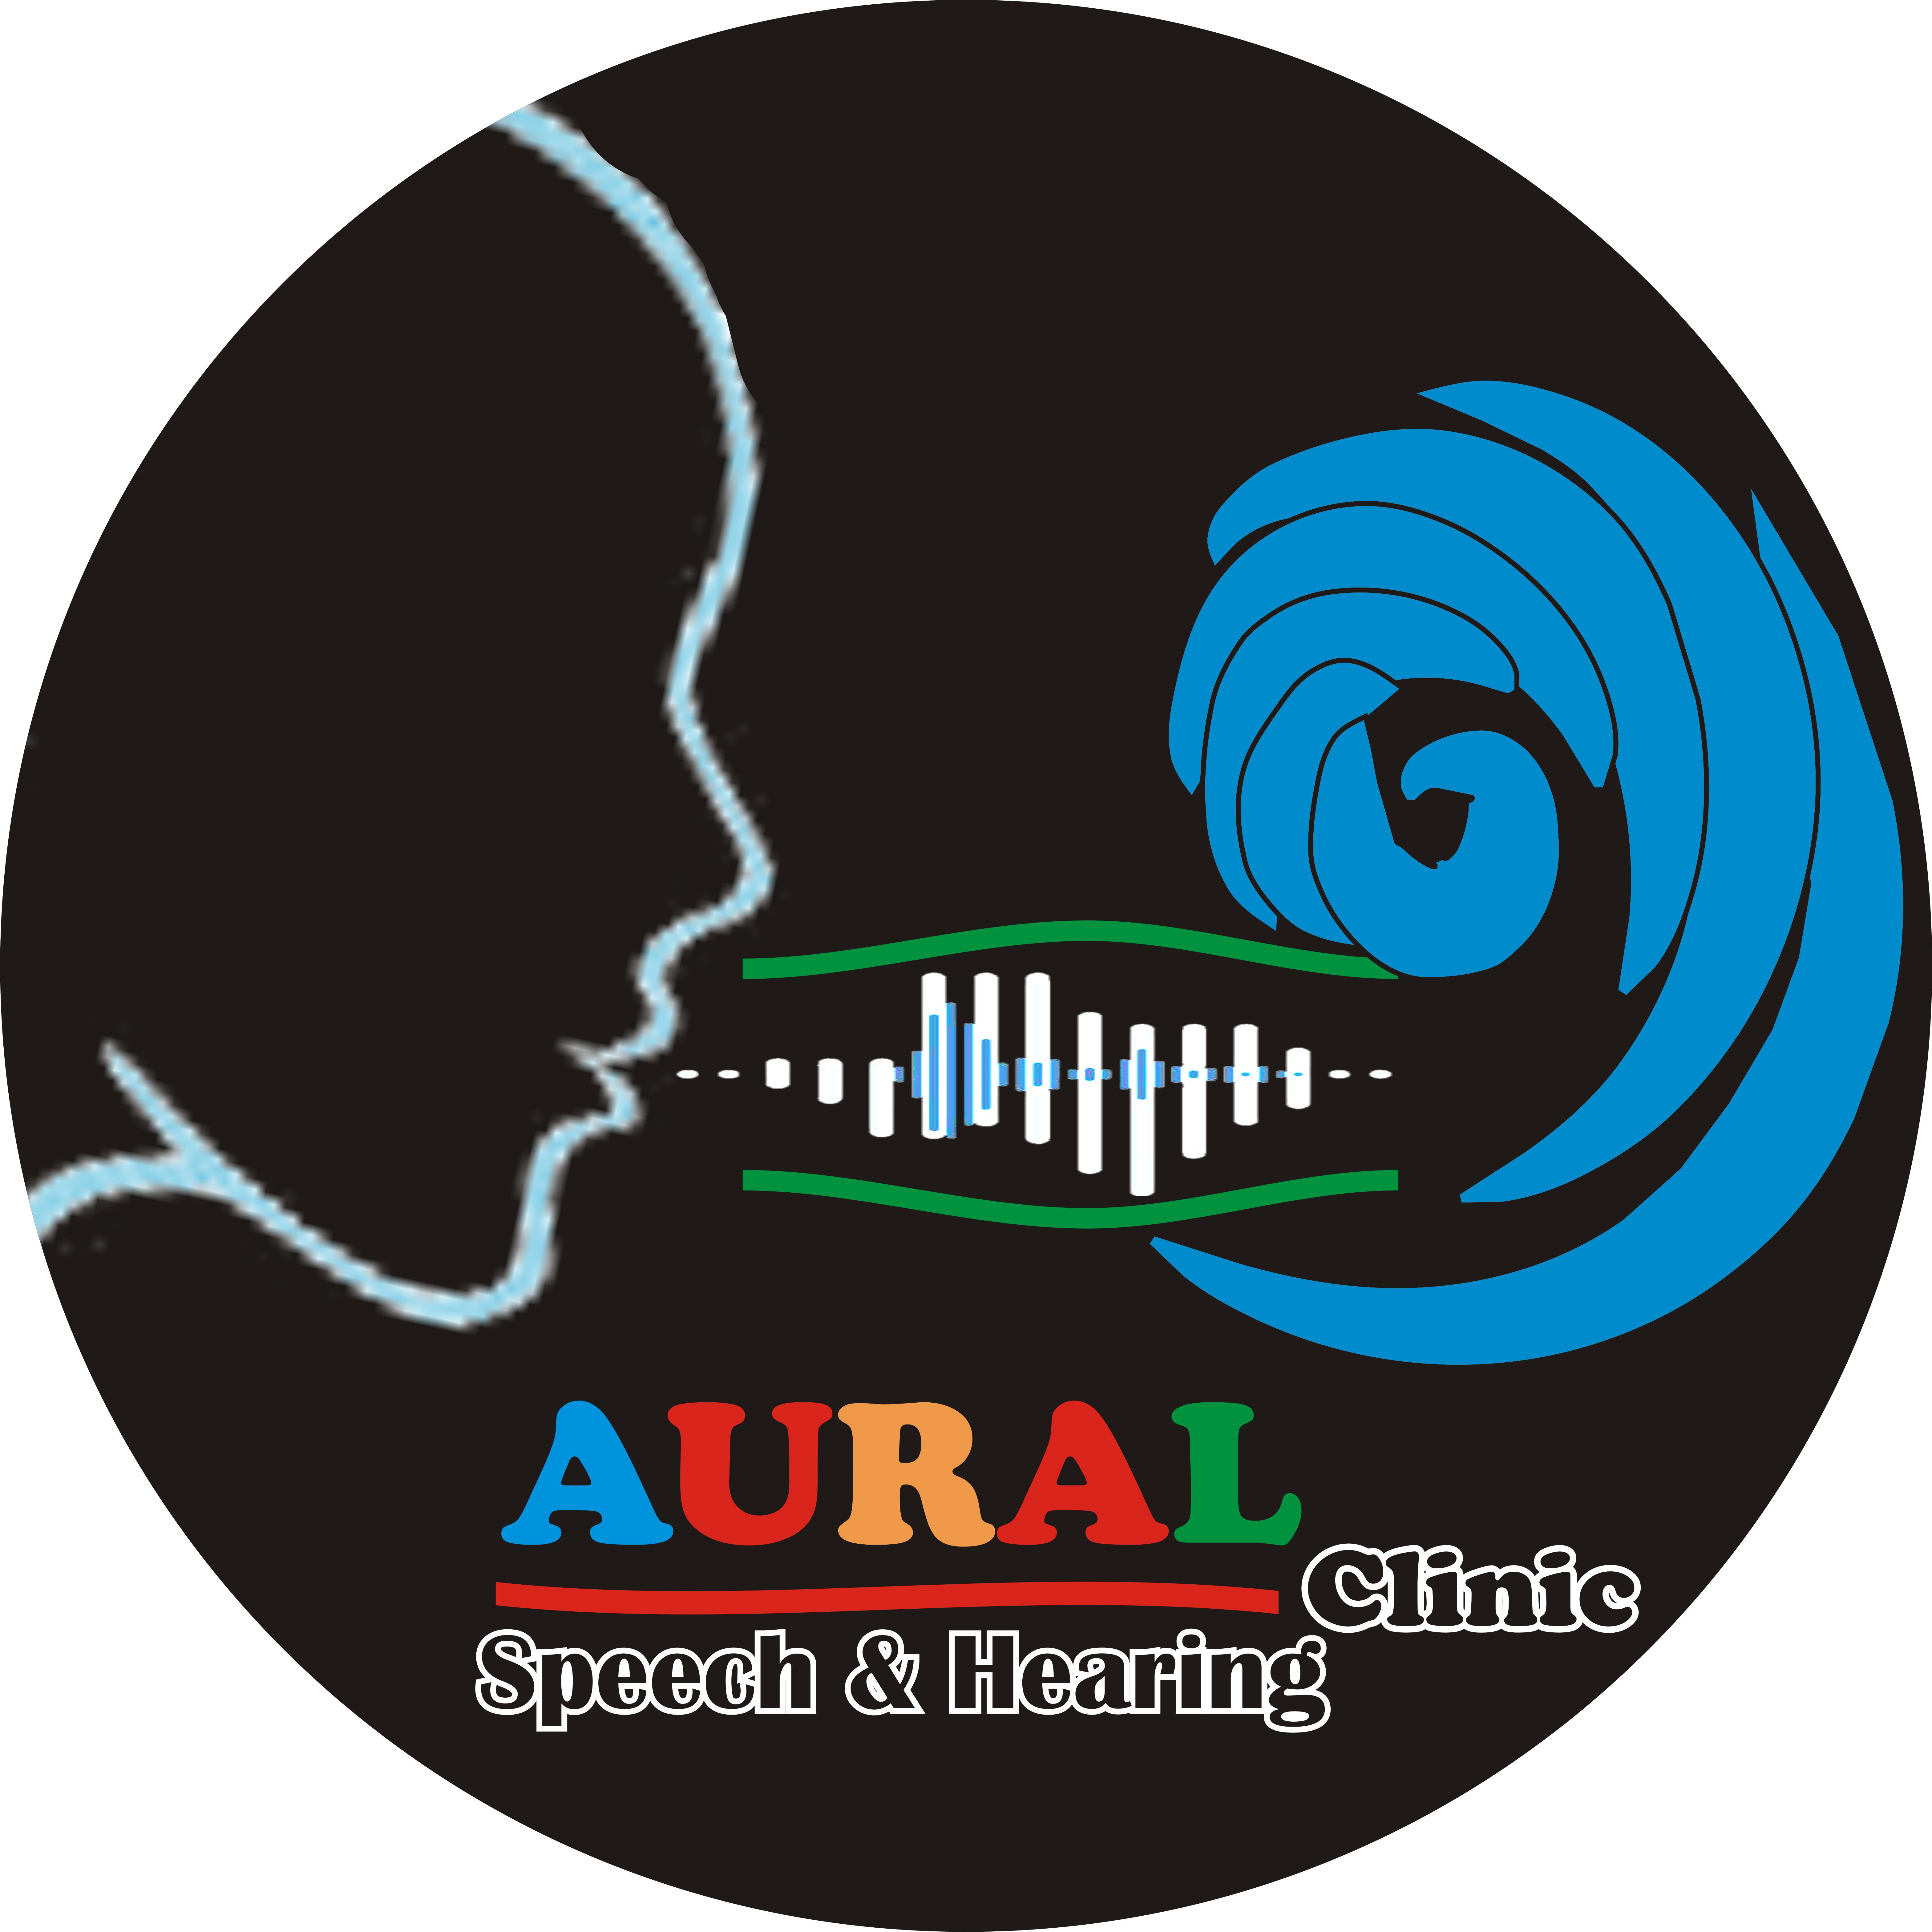 Aural Speech And Hearing Clinic